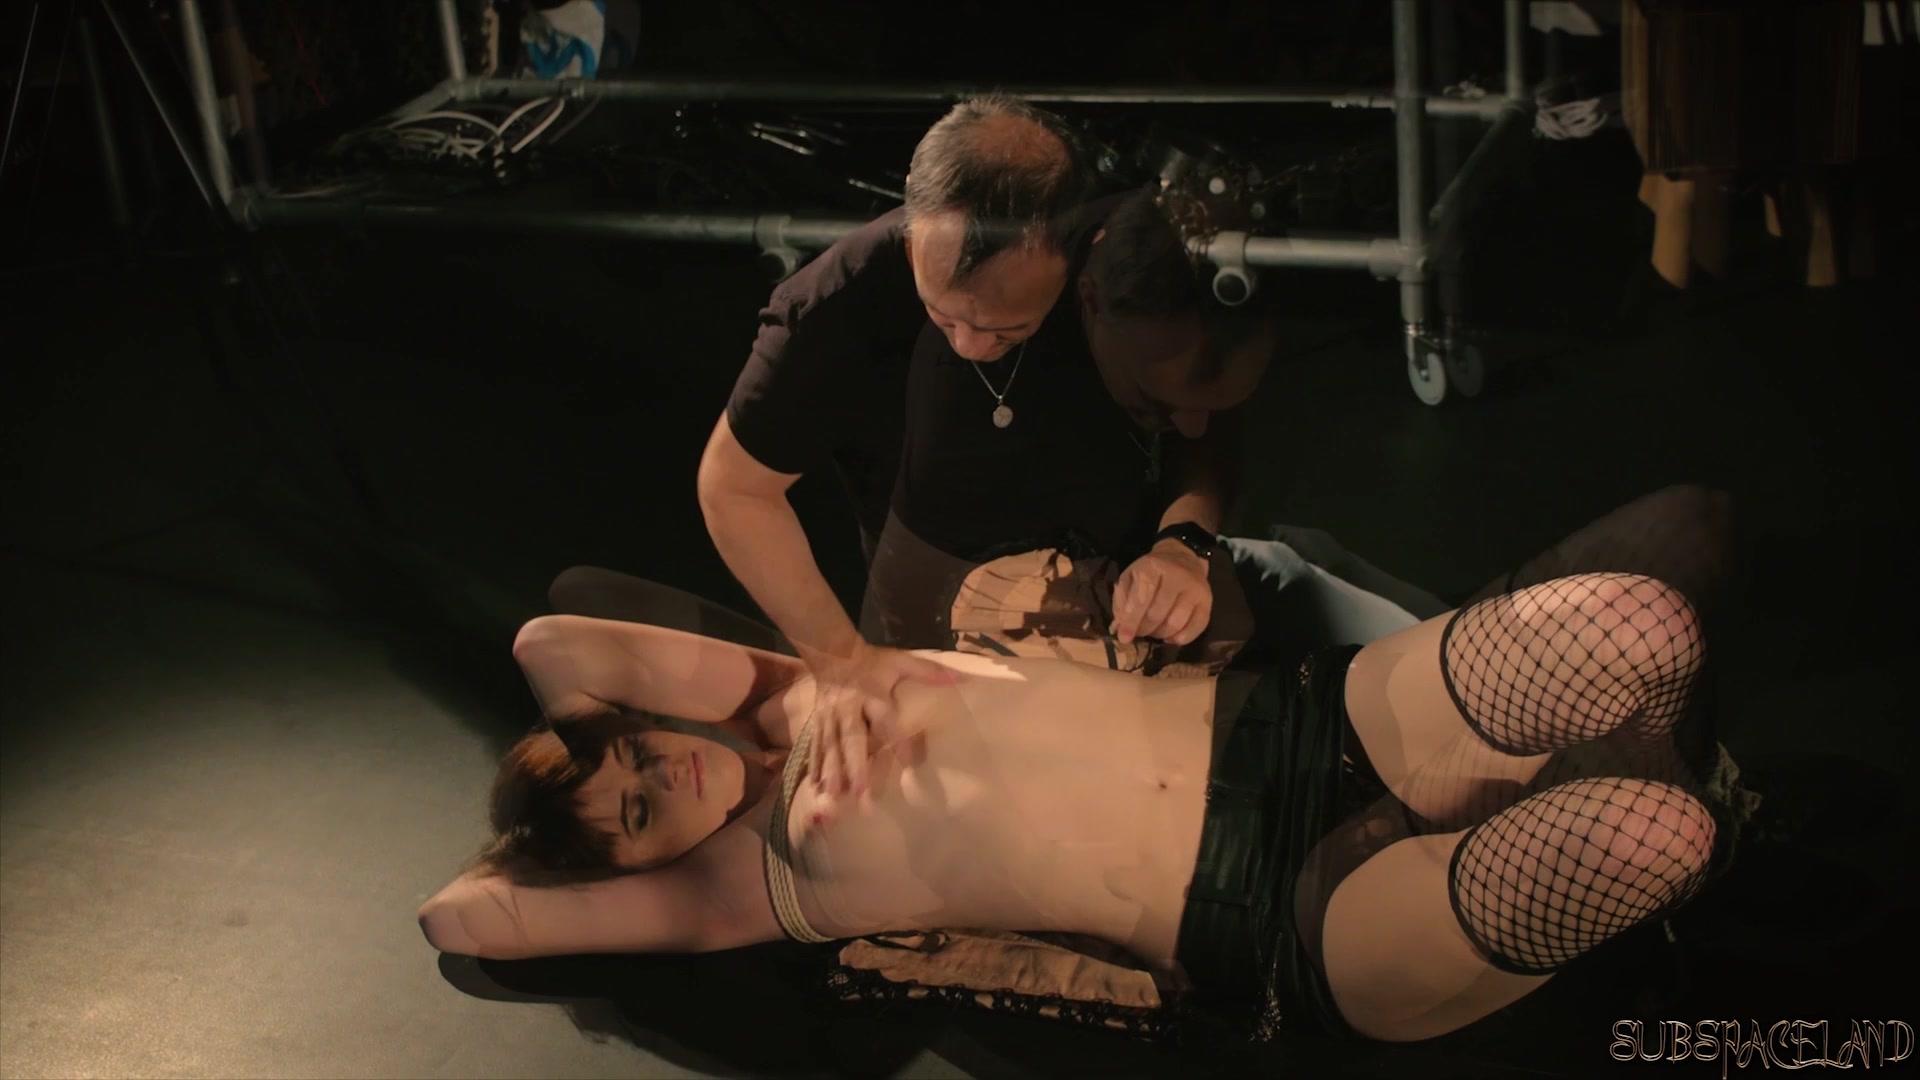 Nightmare Bondage Porn Videos ▷ tickling nightmare for submissive slut - / porno movies